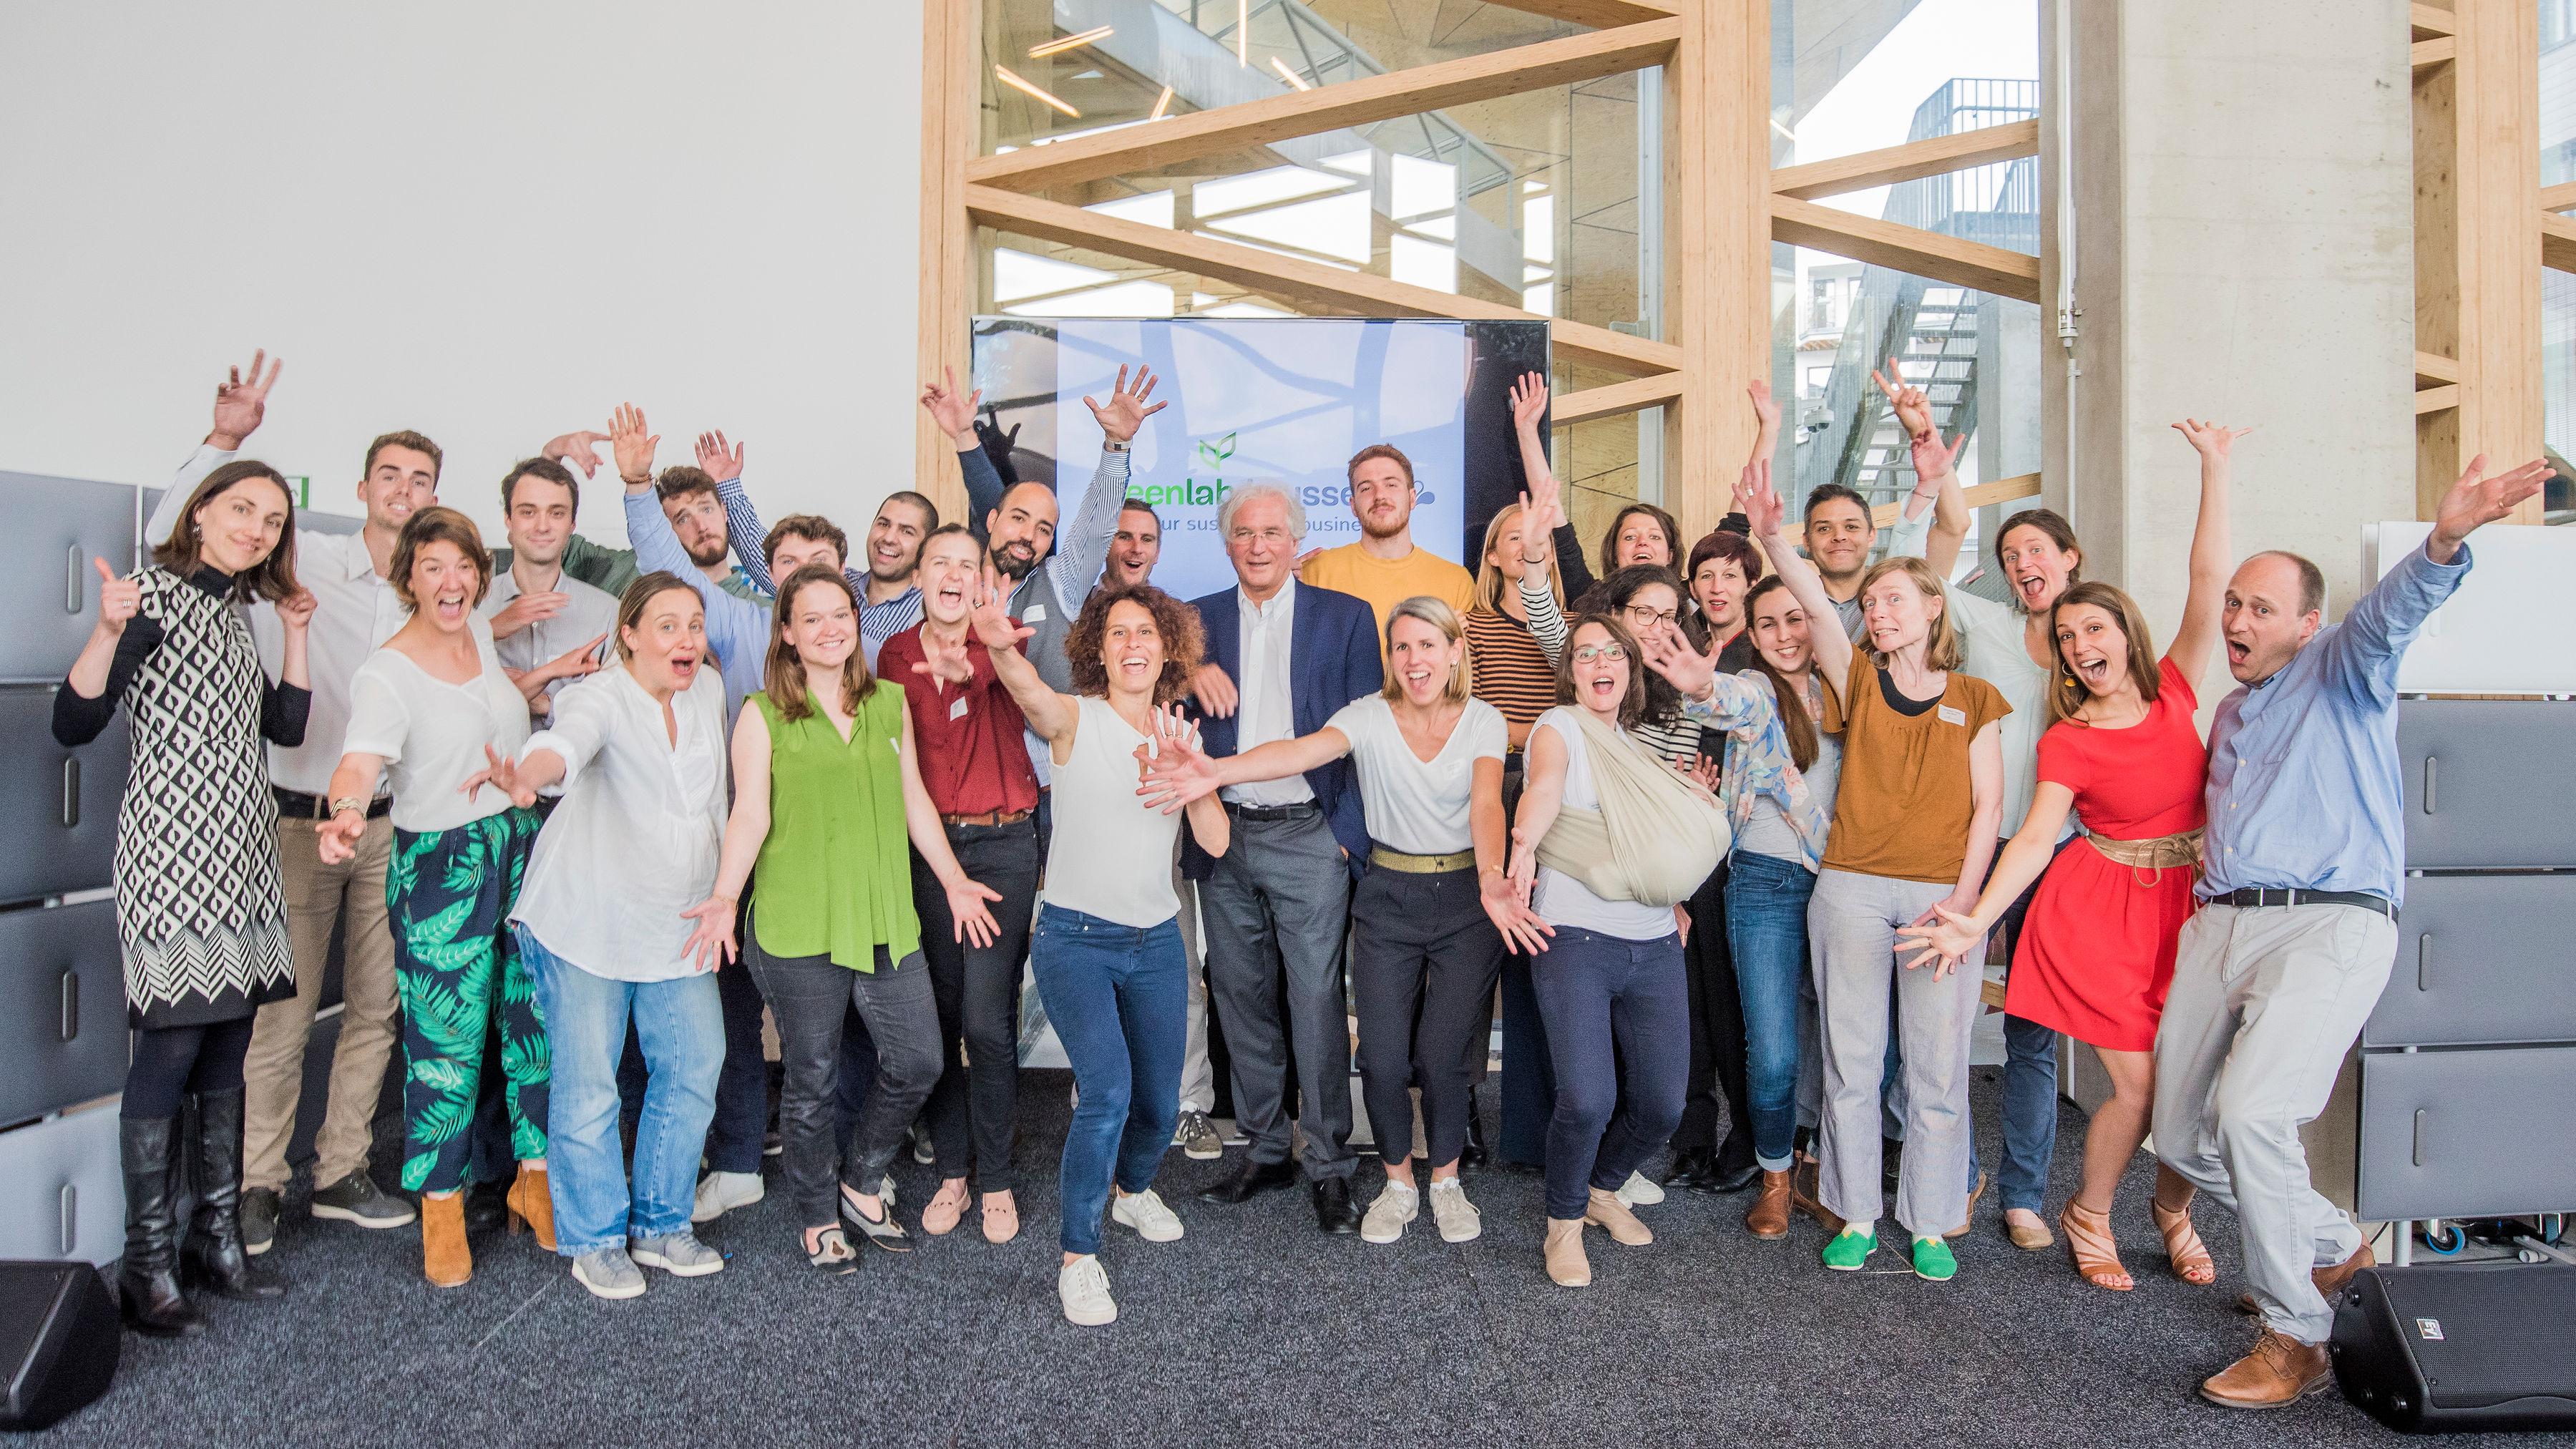 Generation Greenlab: green, socially-aware business